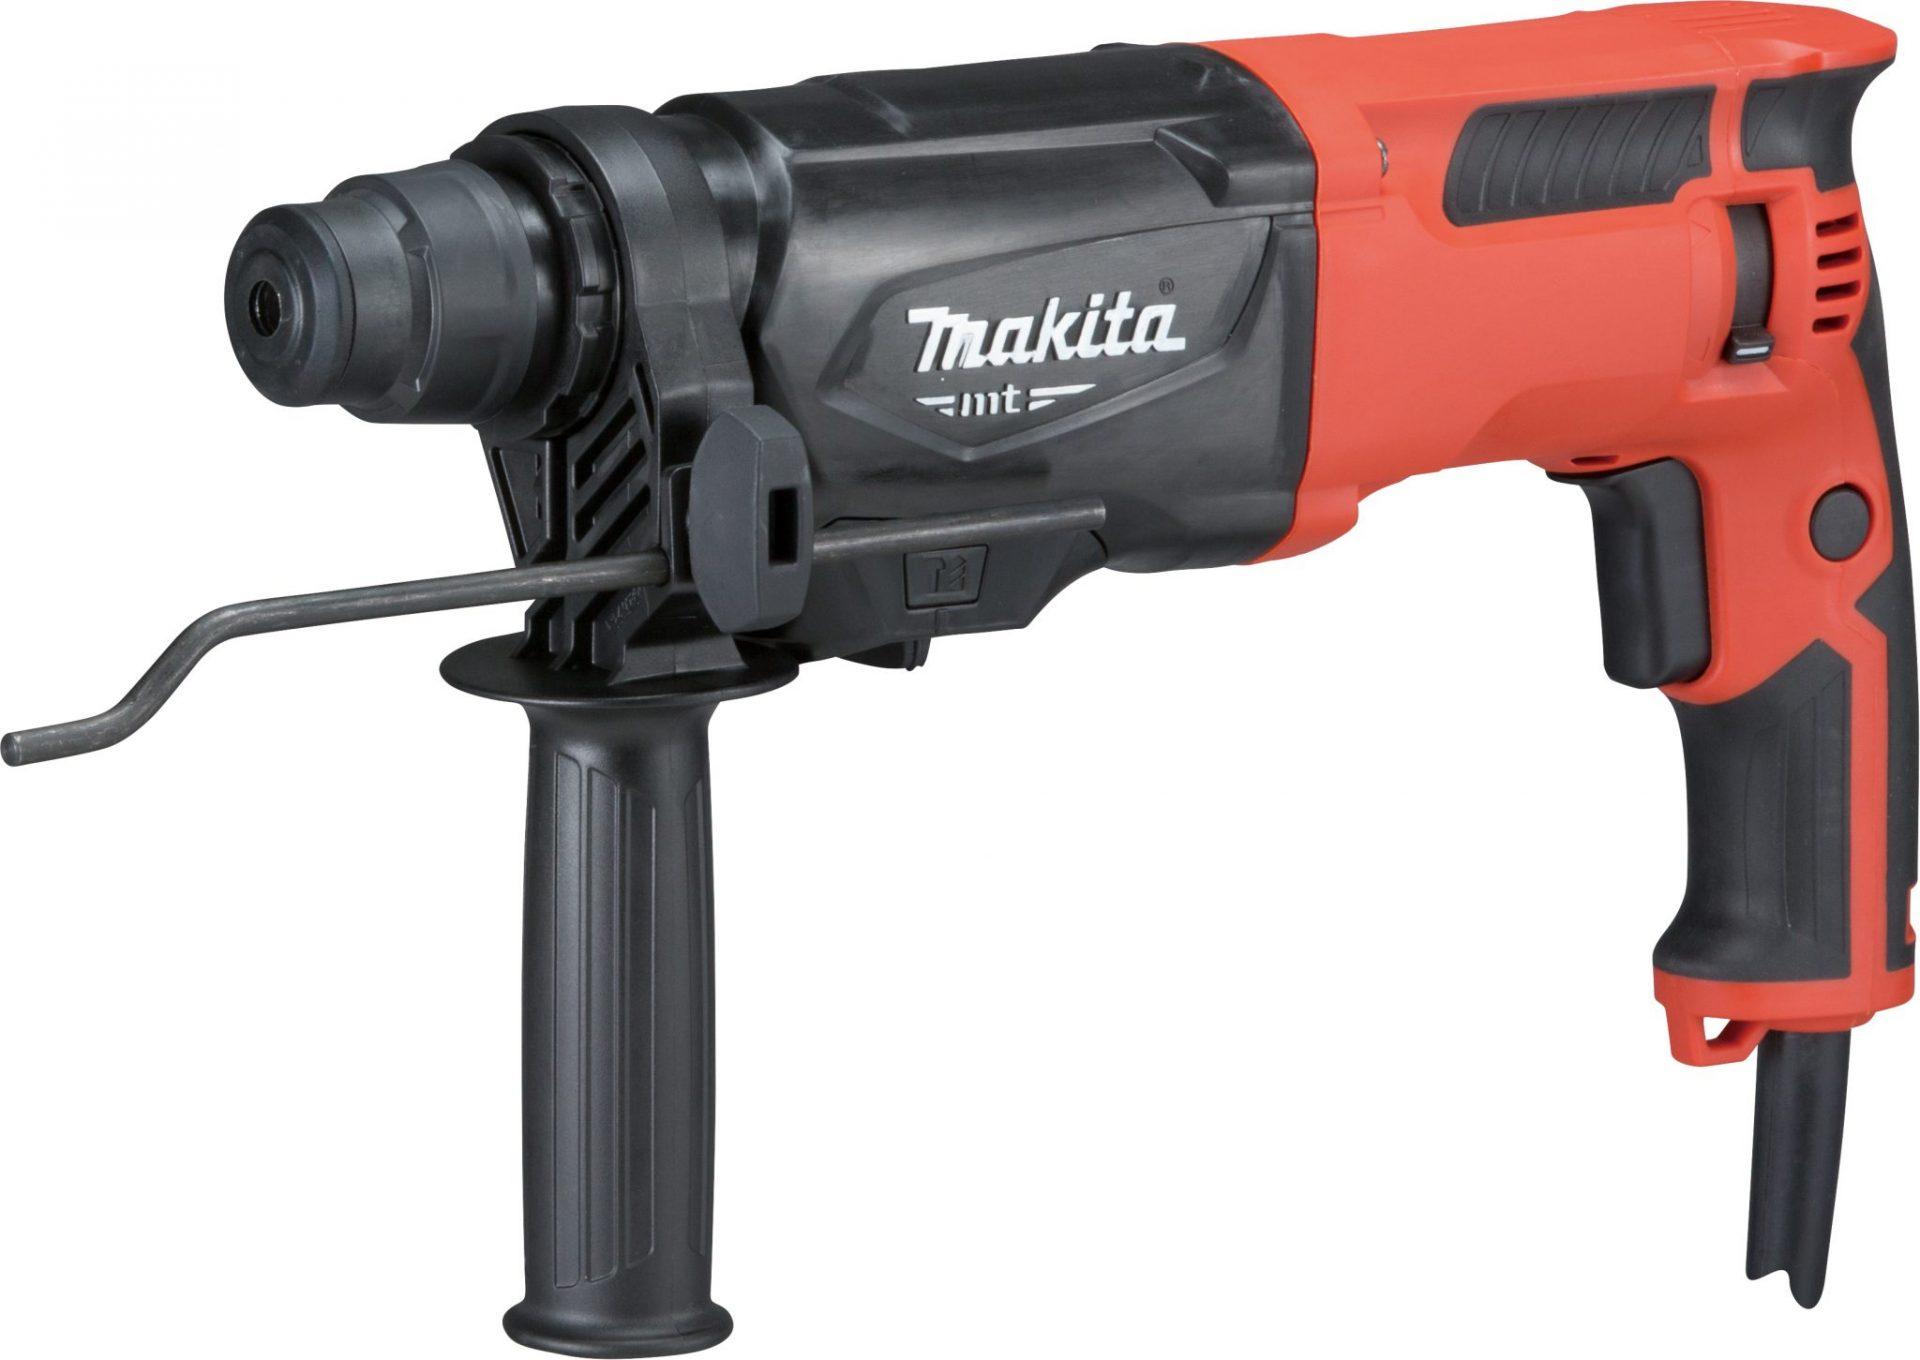 Makita M8701 MT Series SDS Rotary Hammer Drill 240v